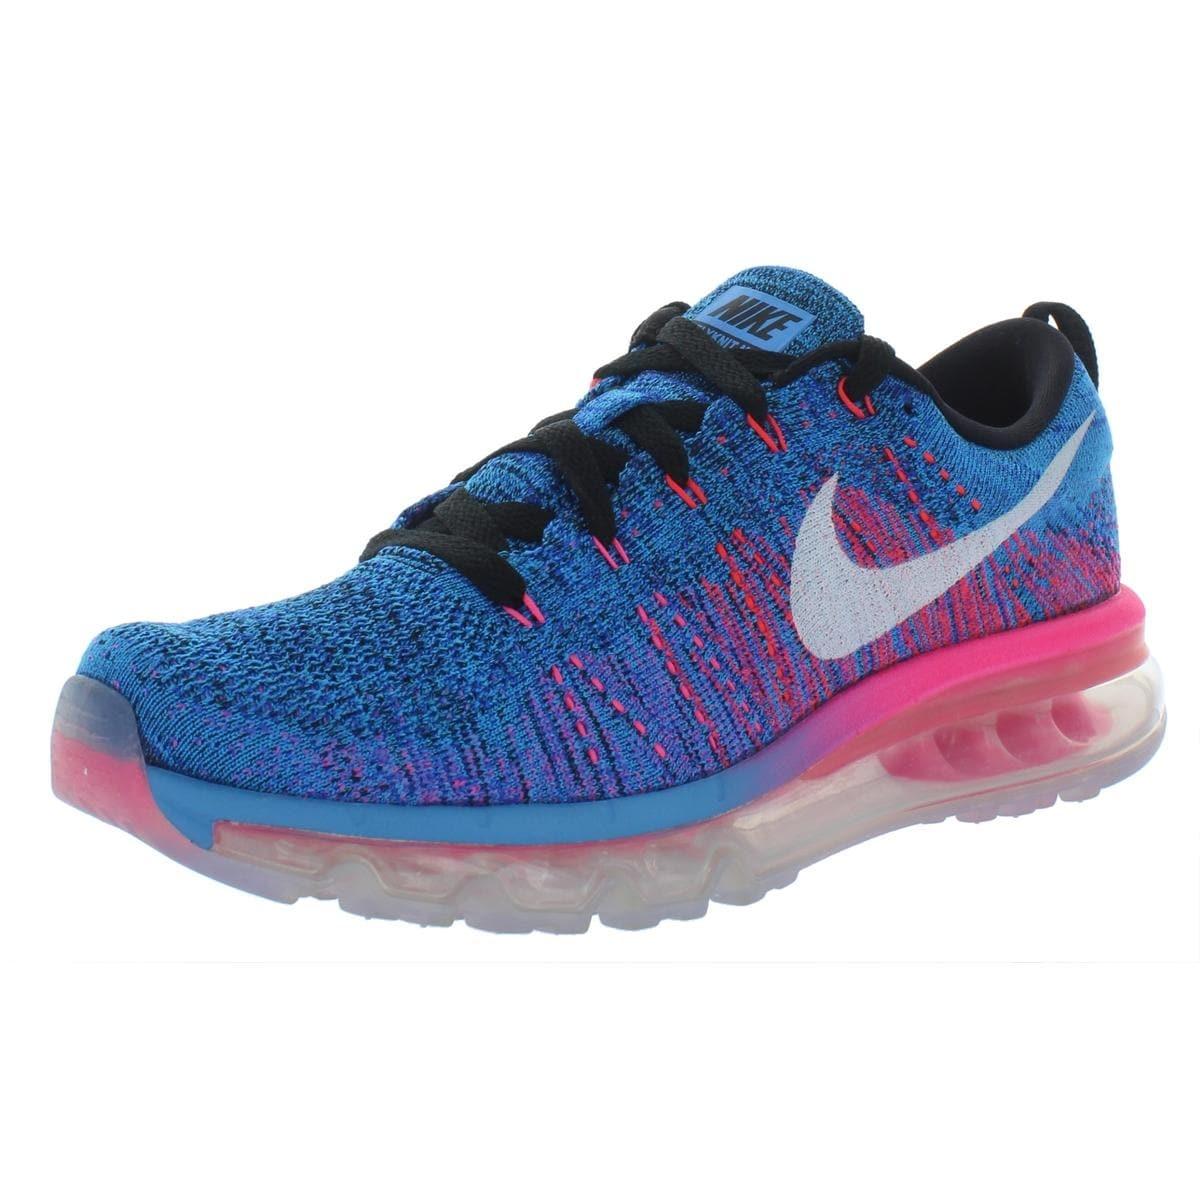 Shop Black Friday Deals on Nike Womens